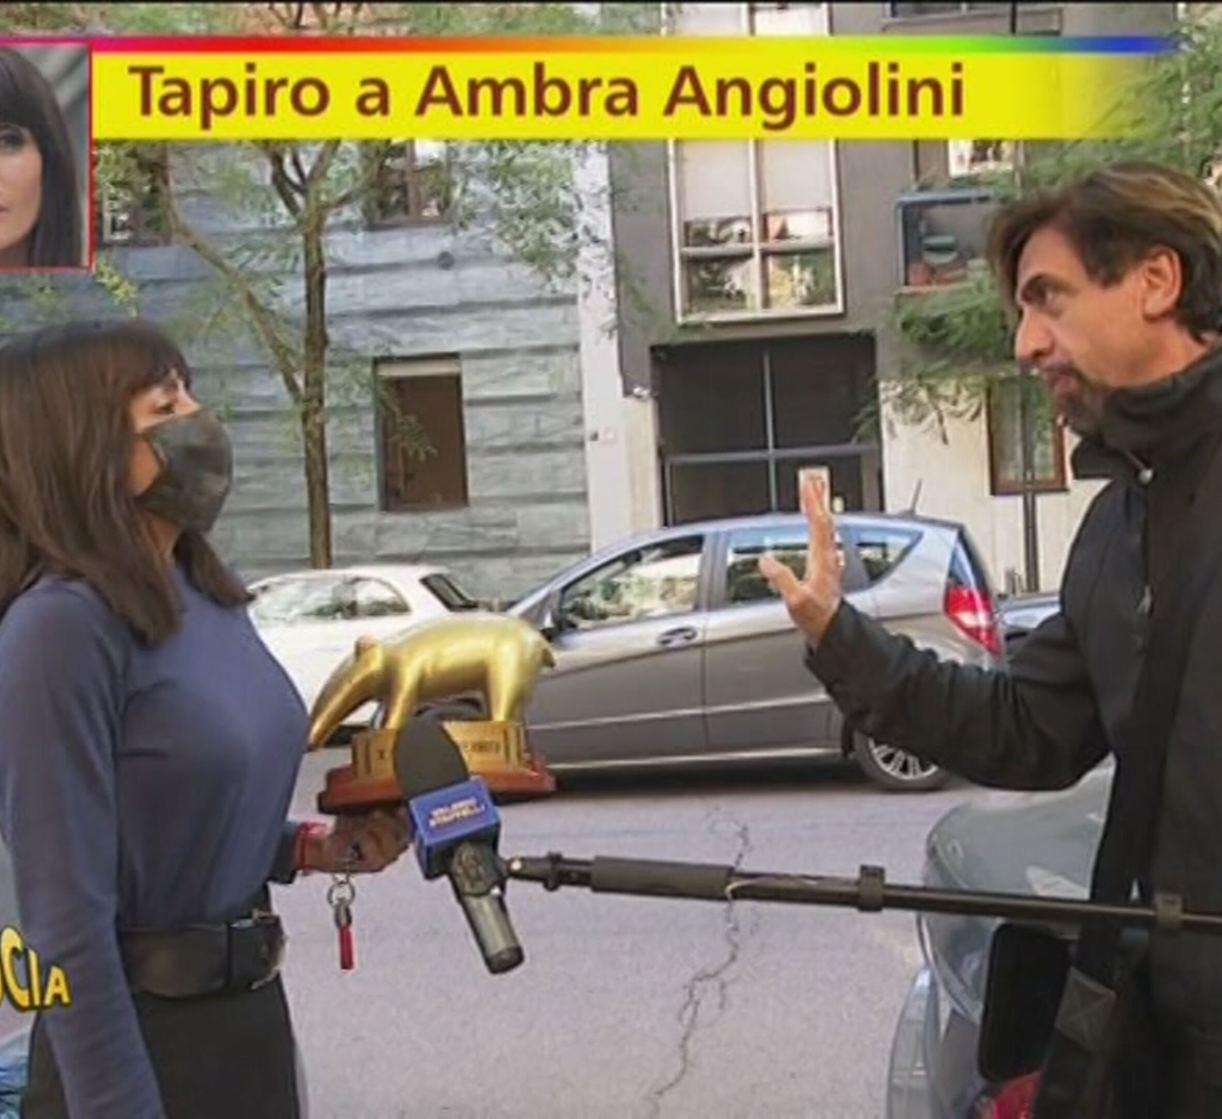 Ambra Angiolini tapiro imbarazzo